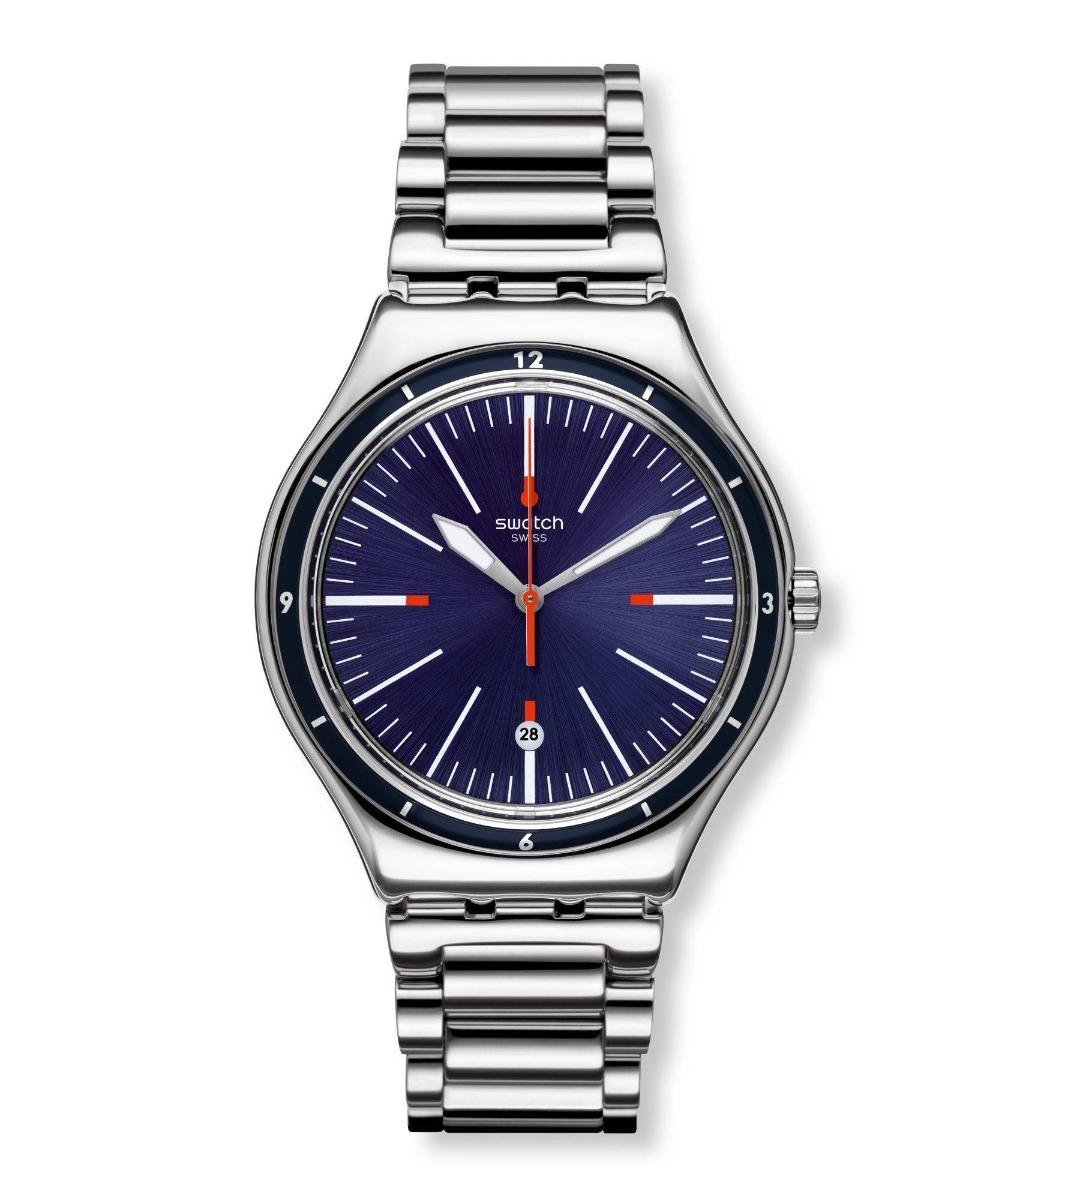 Angrey Reloj Envío HombreOriginal Swatch Yws418g Gratis kZOuwXiPT